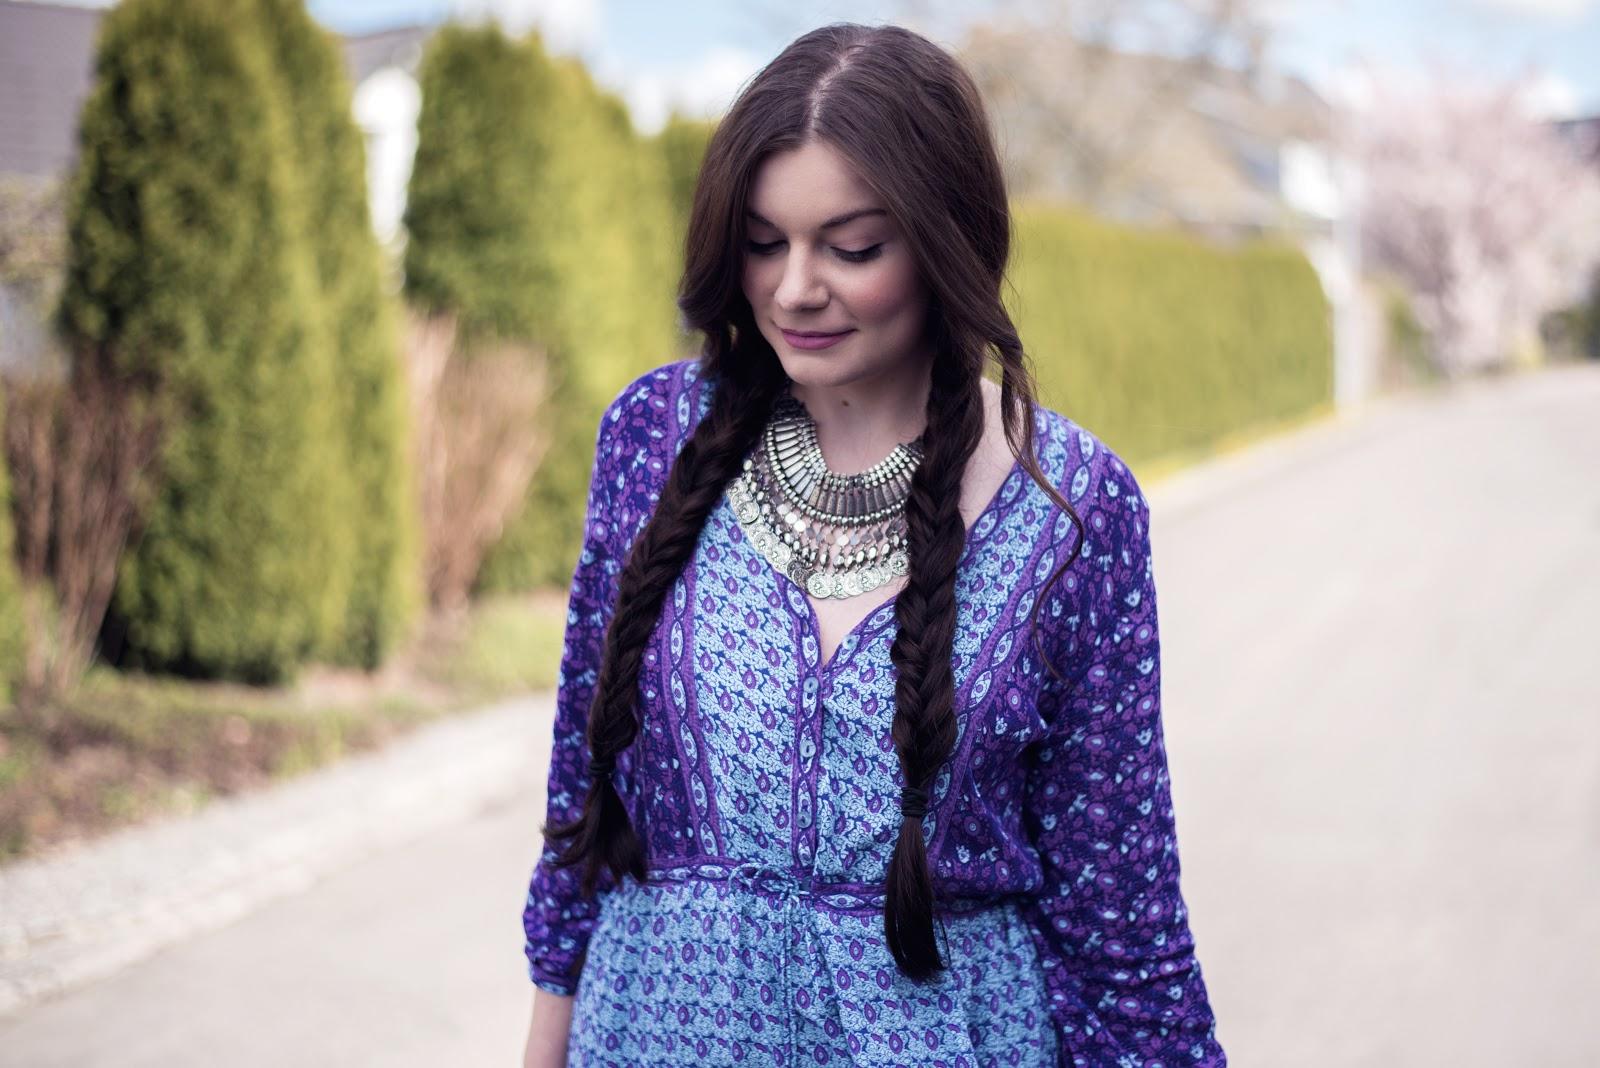 Easy Festival Hairstyle | Two Fishtail Braids | Arnhem Florence Dress in Opal | Rose Kiara Peaches